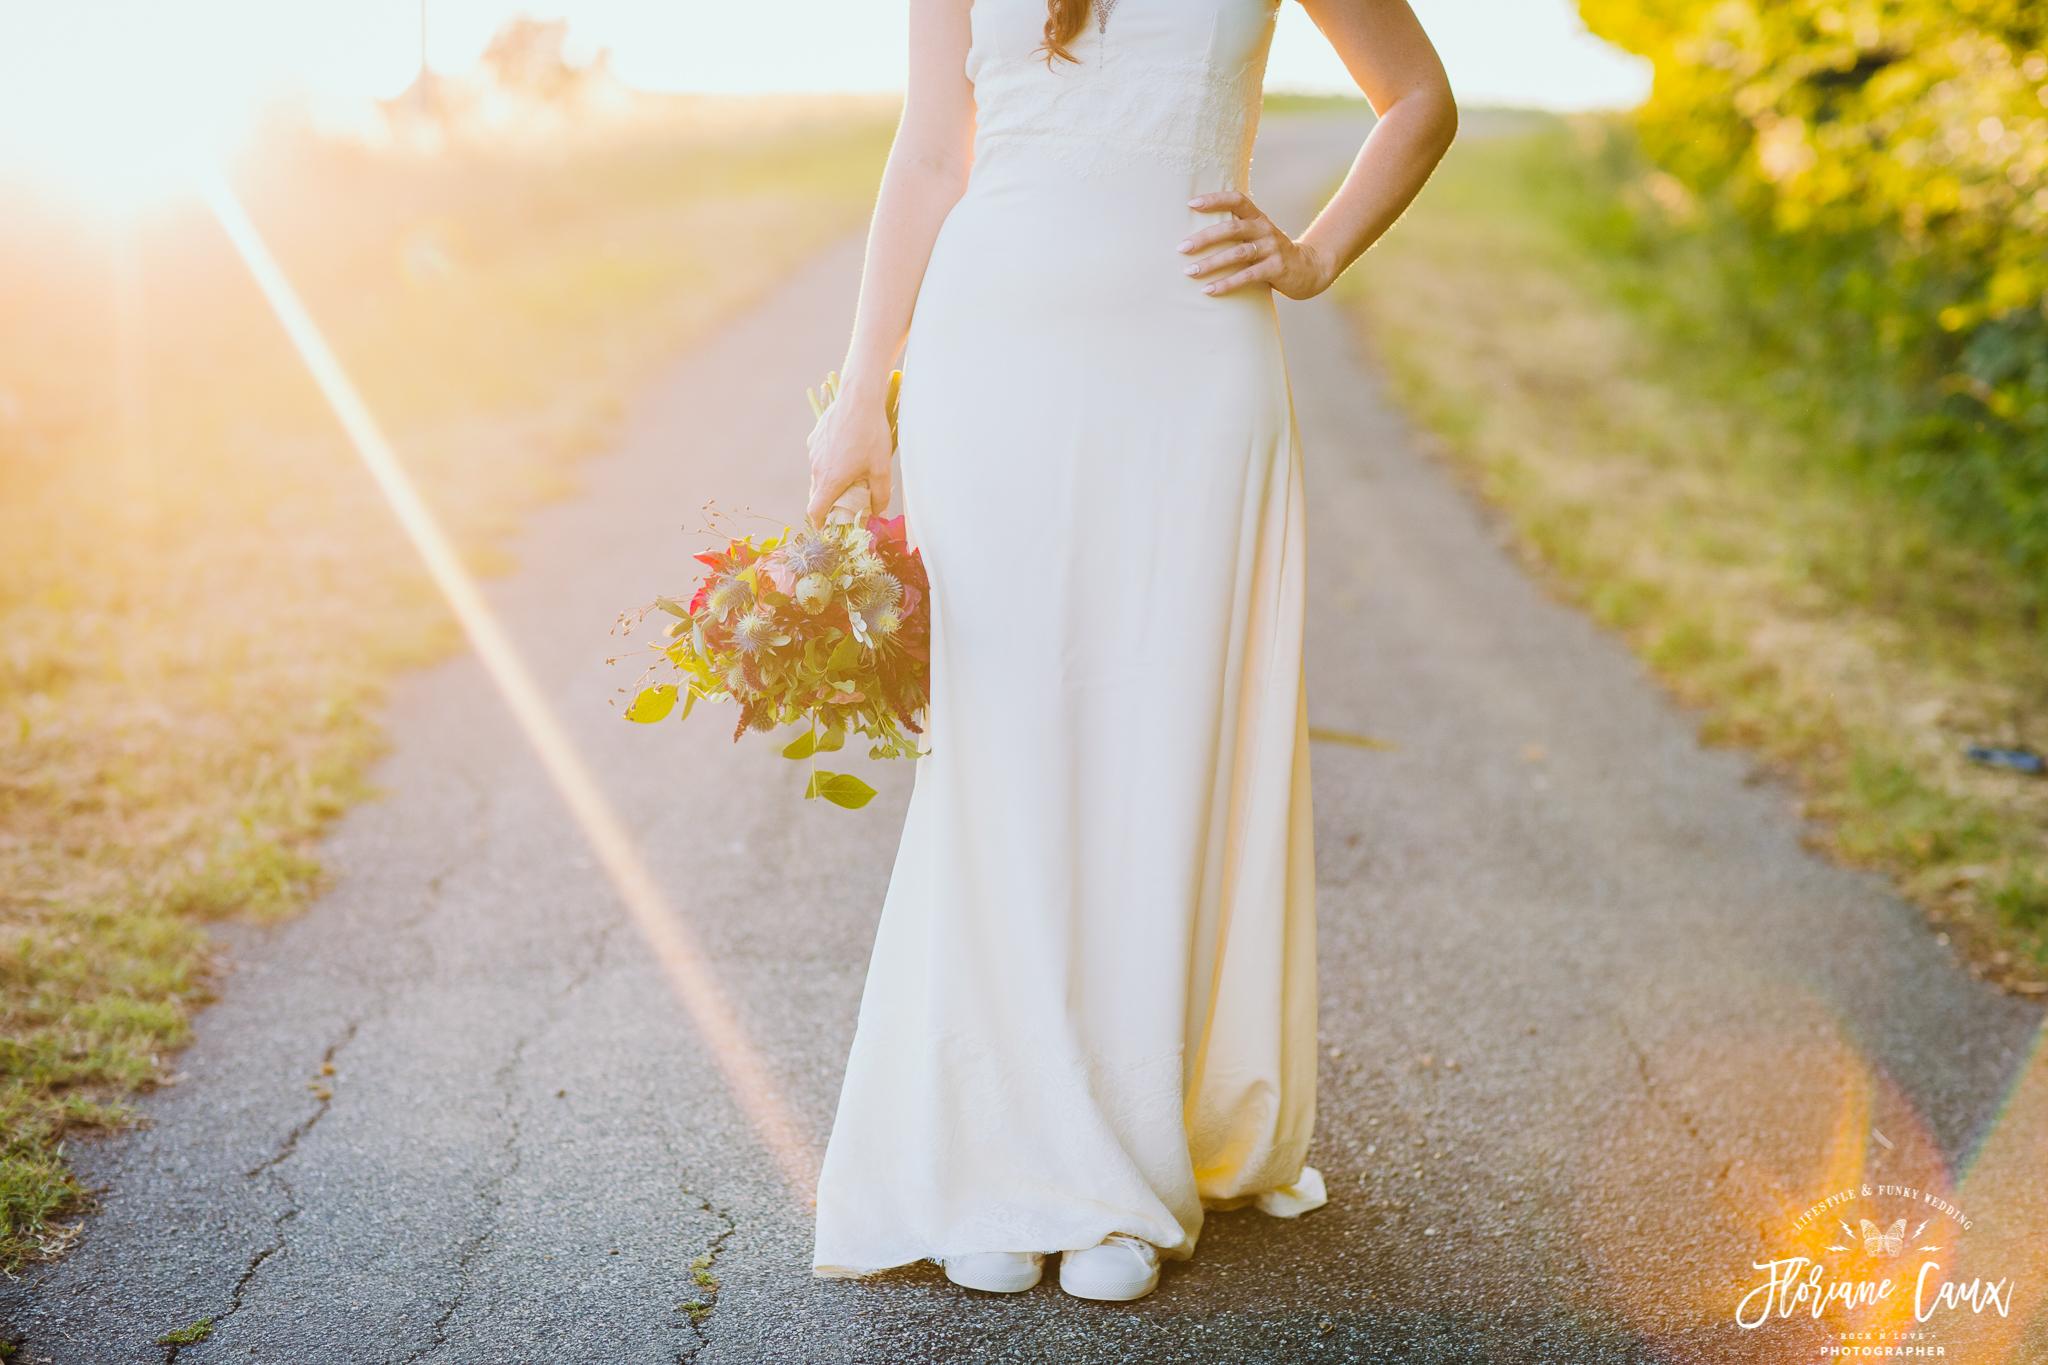 photographe-mariage-toulouse-rocknroll-maries-tatoues-floriane-caux-80